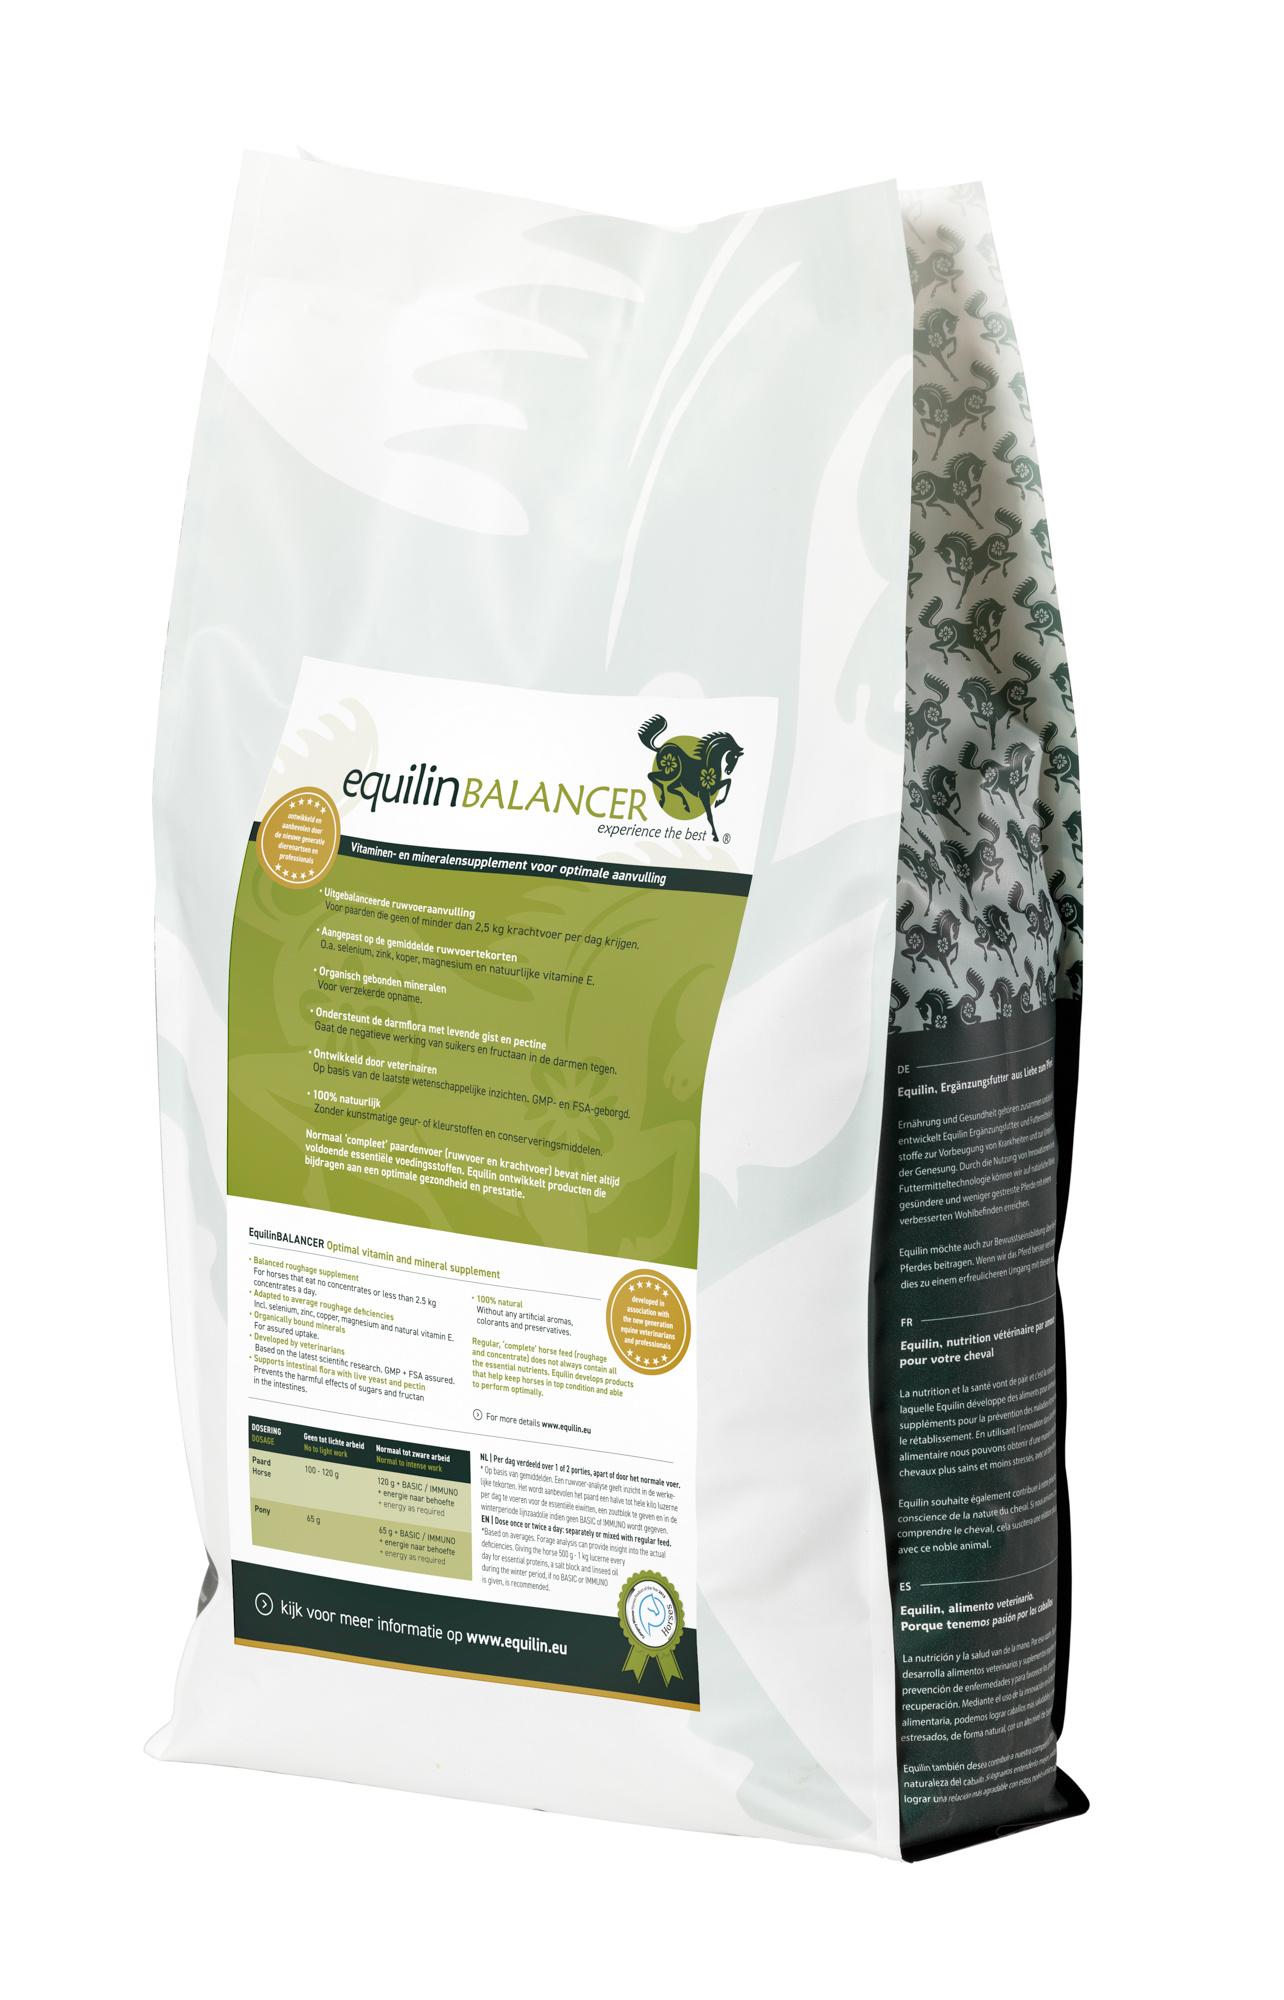 EquilinBALANCER EquilinBALANCER, Roughage Completion in pellets 6,8 kg